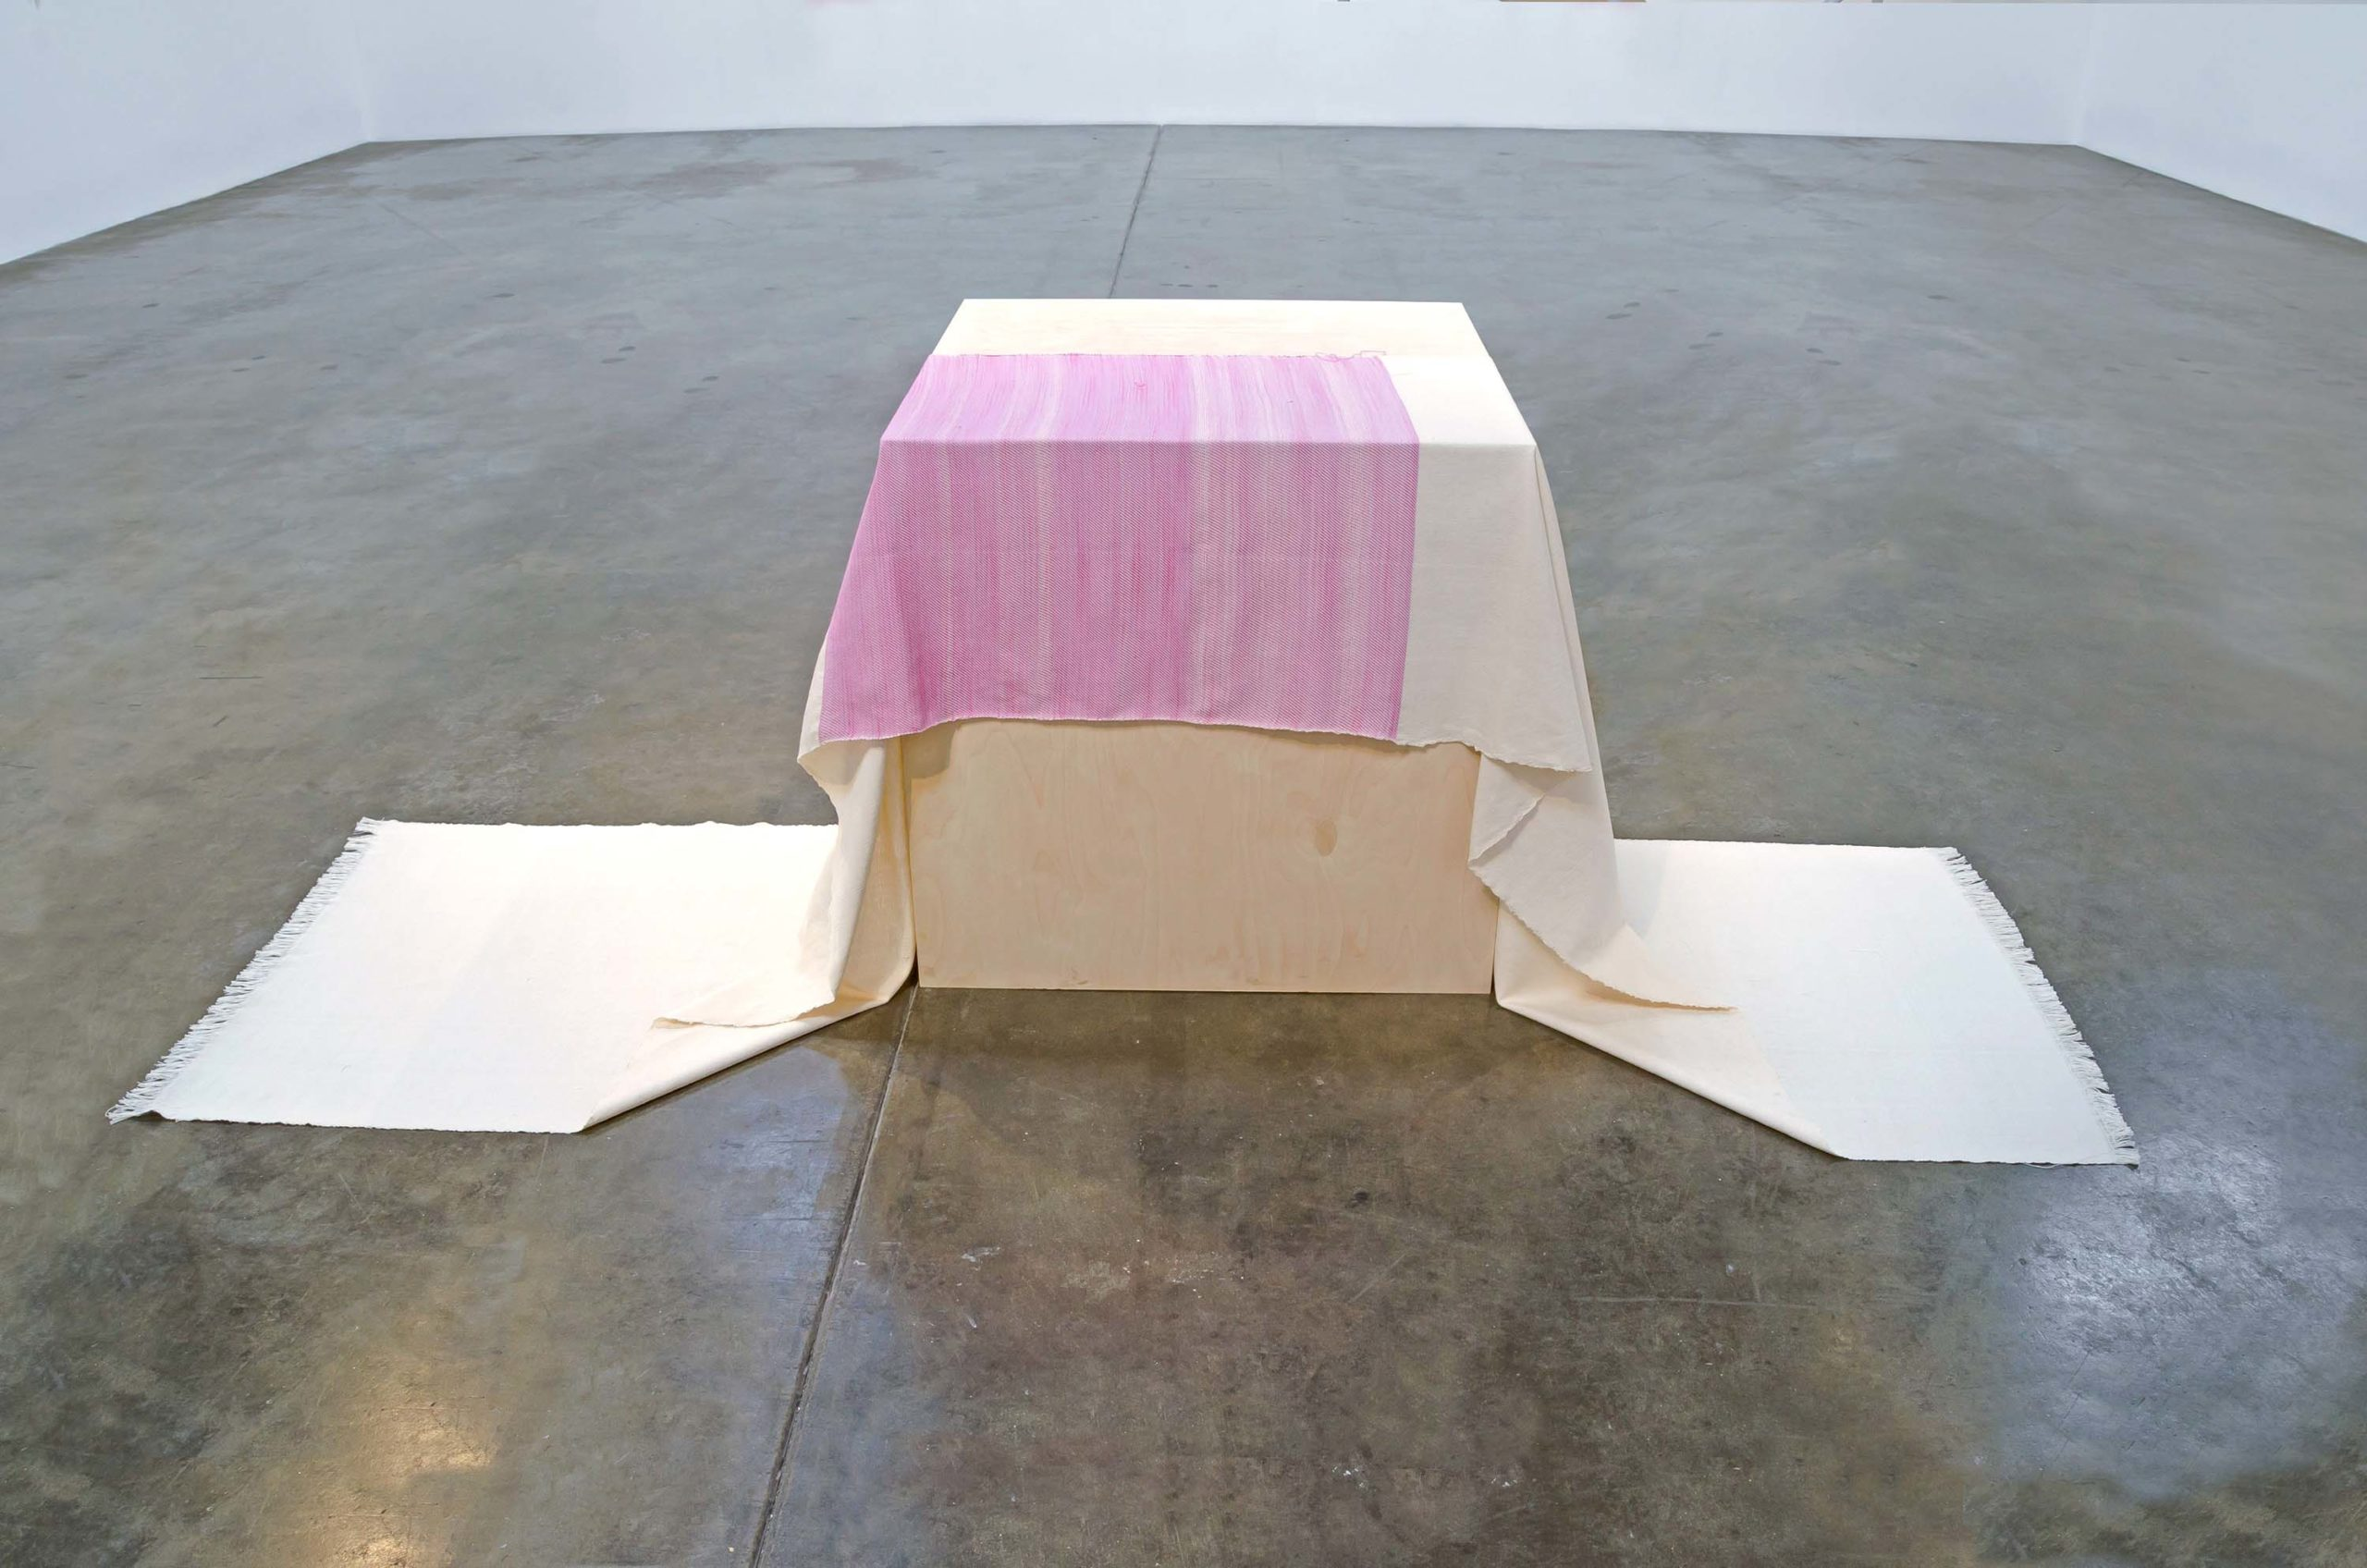 Frances Trombly, Draped Wood Pedestal, 2016